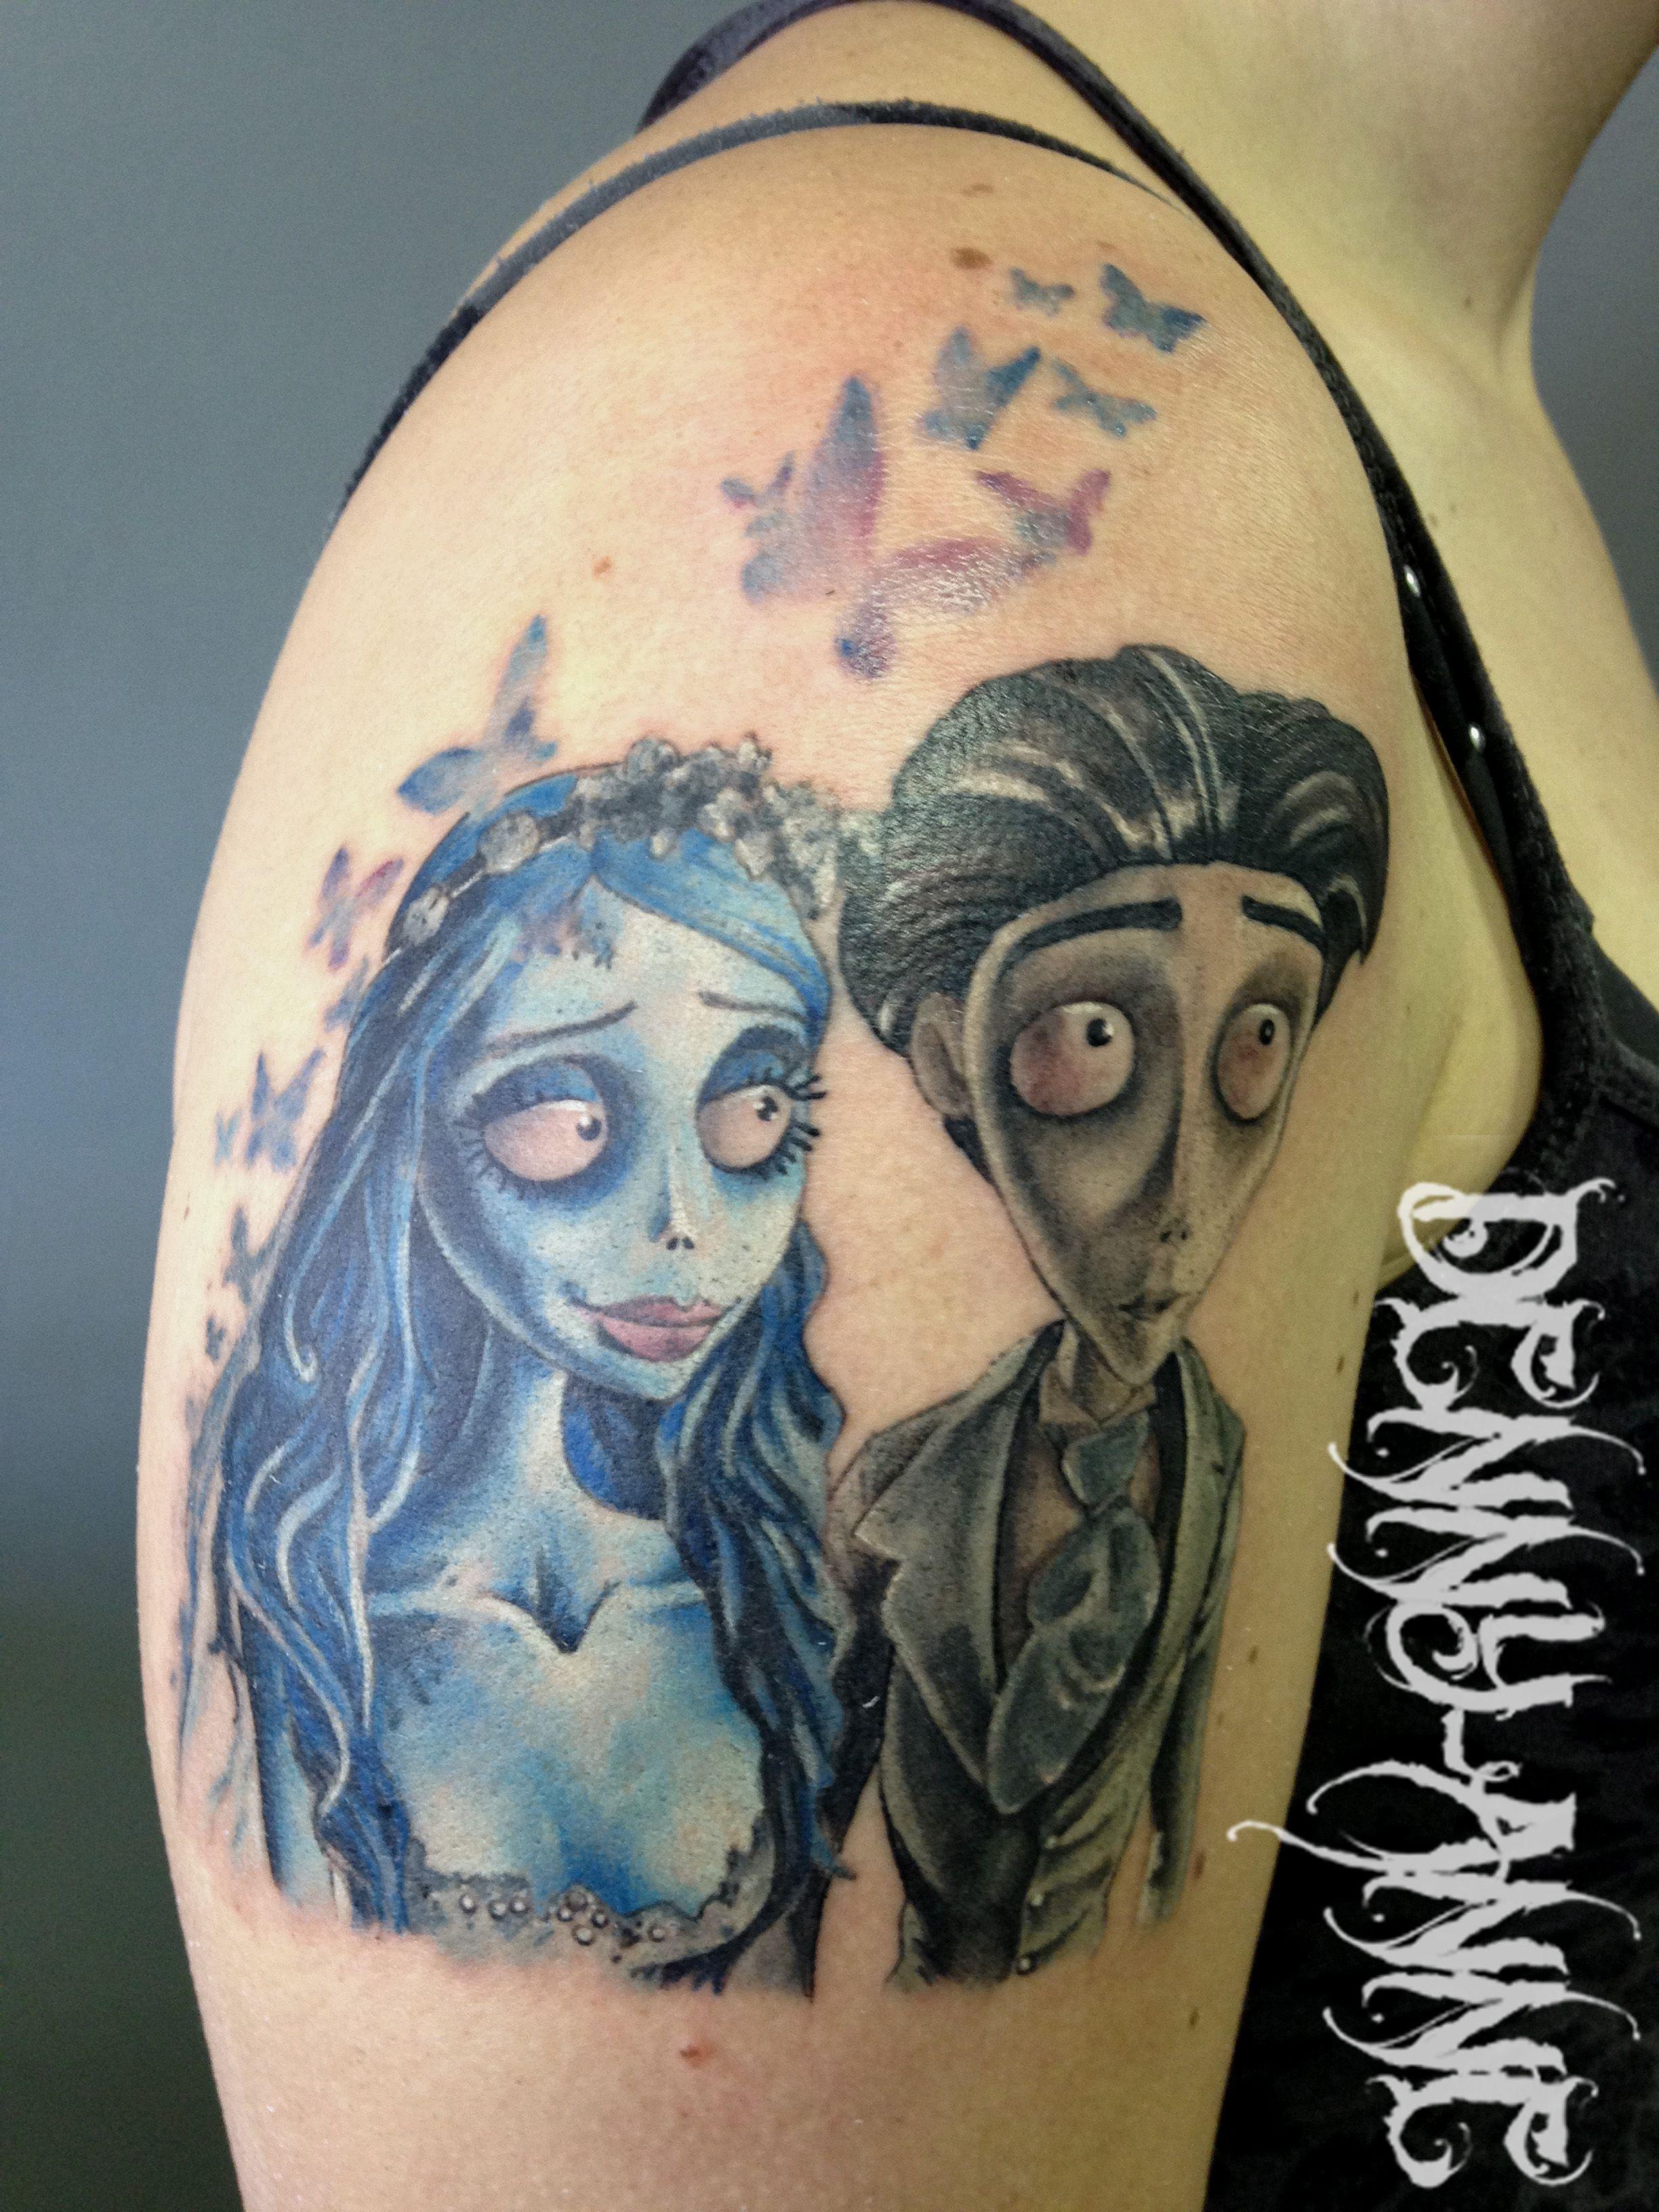 Tattoo color Corpse Bride | Umm body art YES! | Pinterest | Tattoo ... - Tattoo Studio Bielefeld